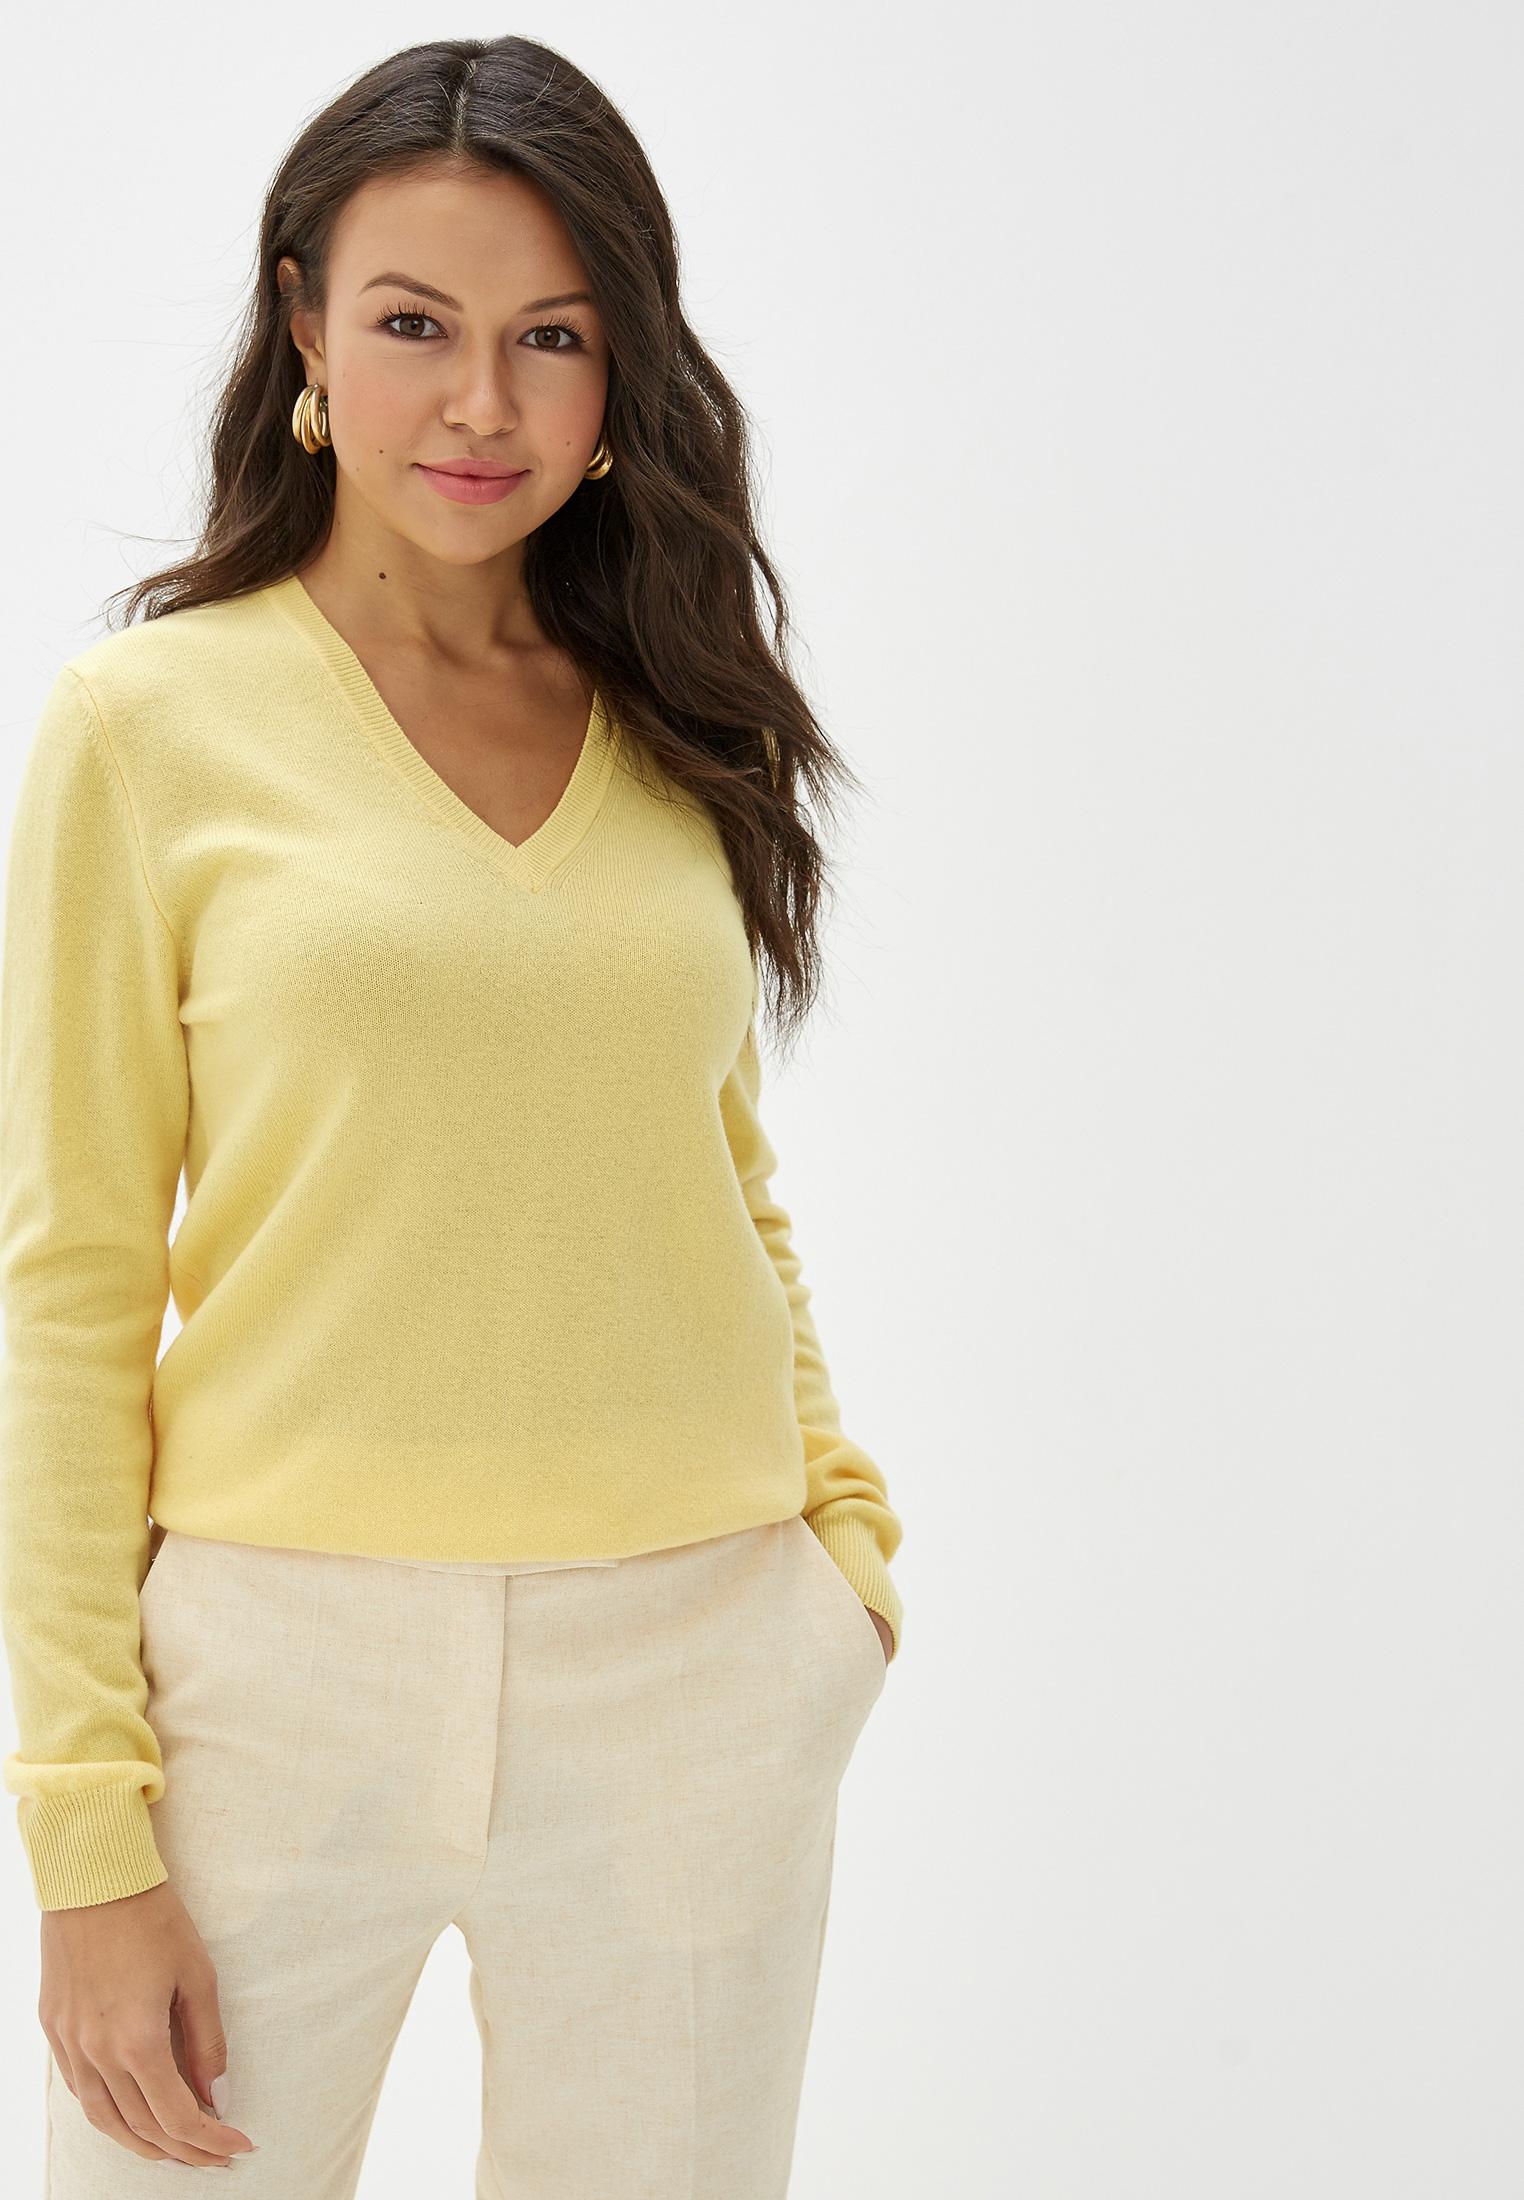 Пуловер United Colors of Benetton (Юнайтед Колорс оф Бенеттон) 1002D4488